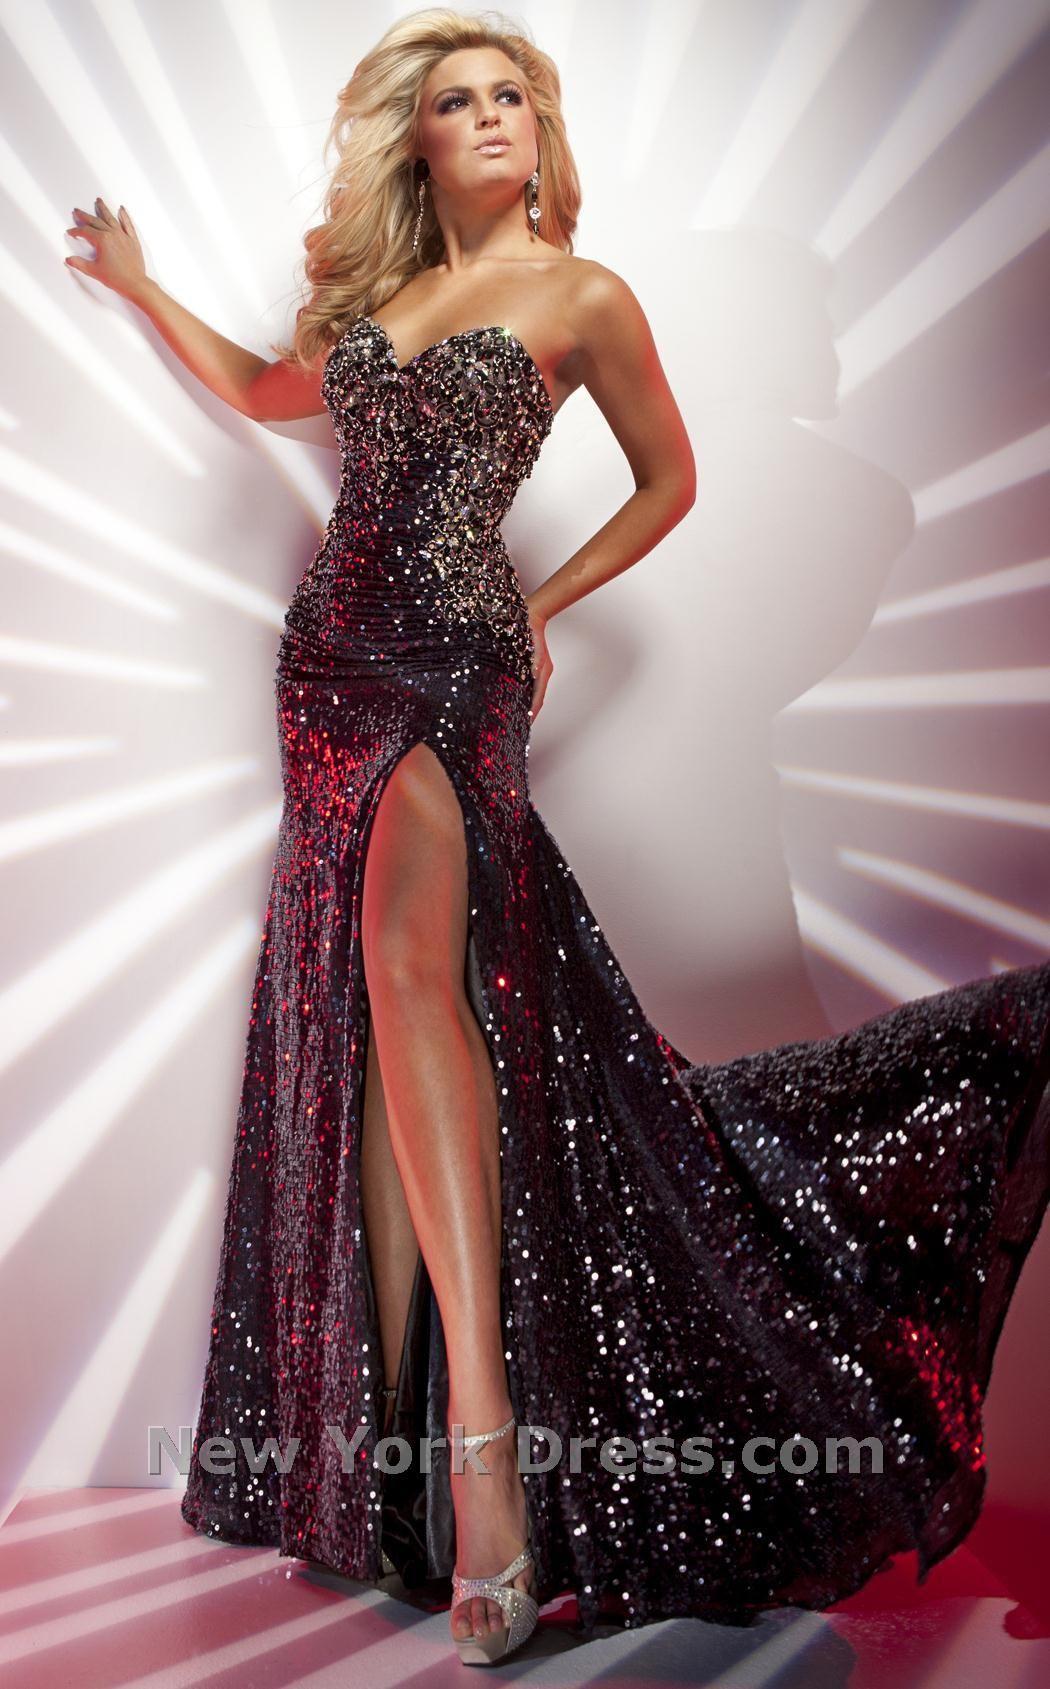 Awesome Diva Prom Dresses Photos - Wedding Dress Ideas ...